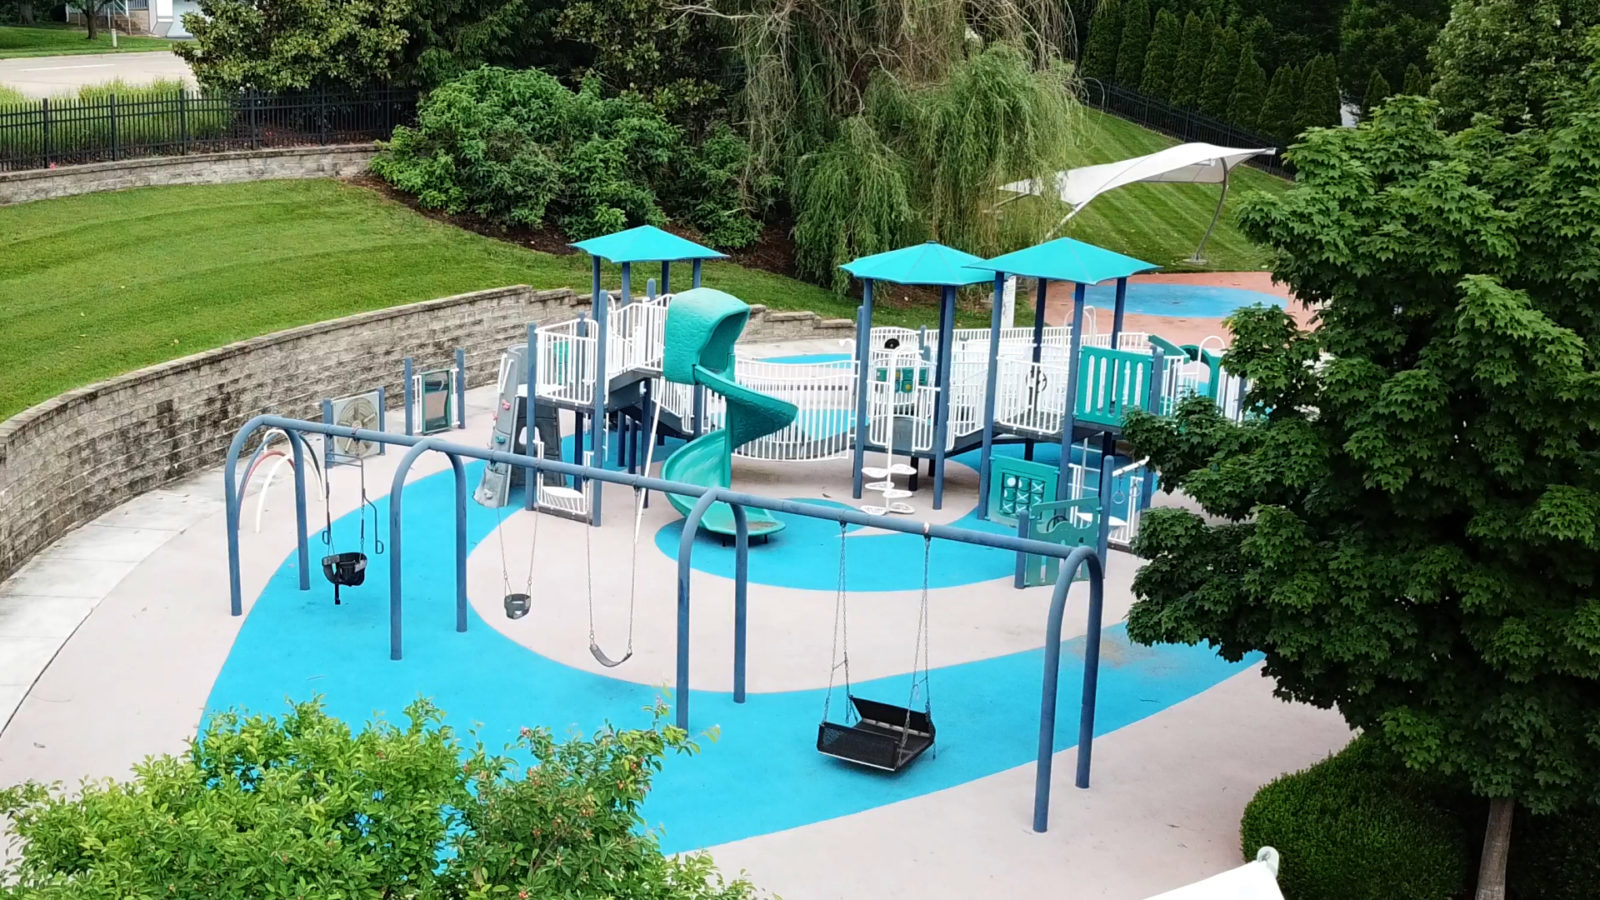 The Outside Playground at Ranken Jordan